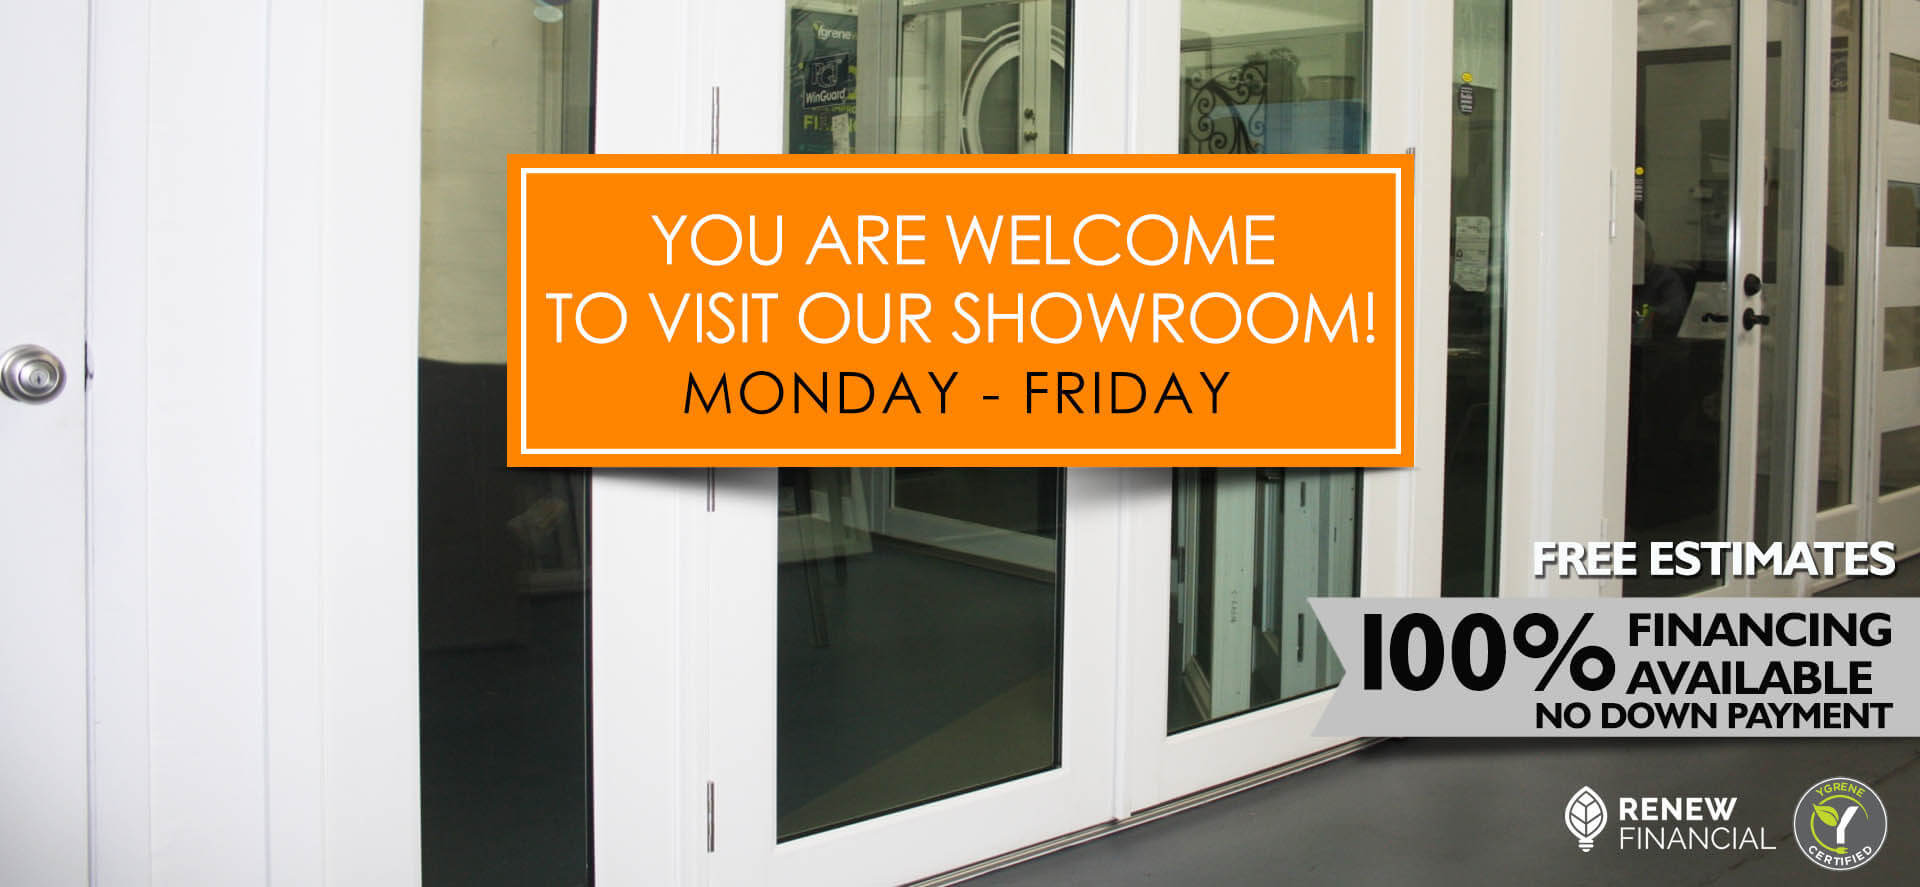 Hurricane Windows Showroom